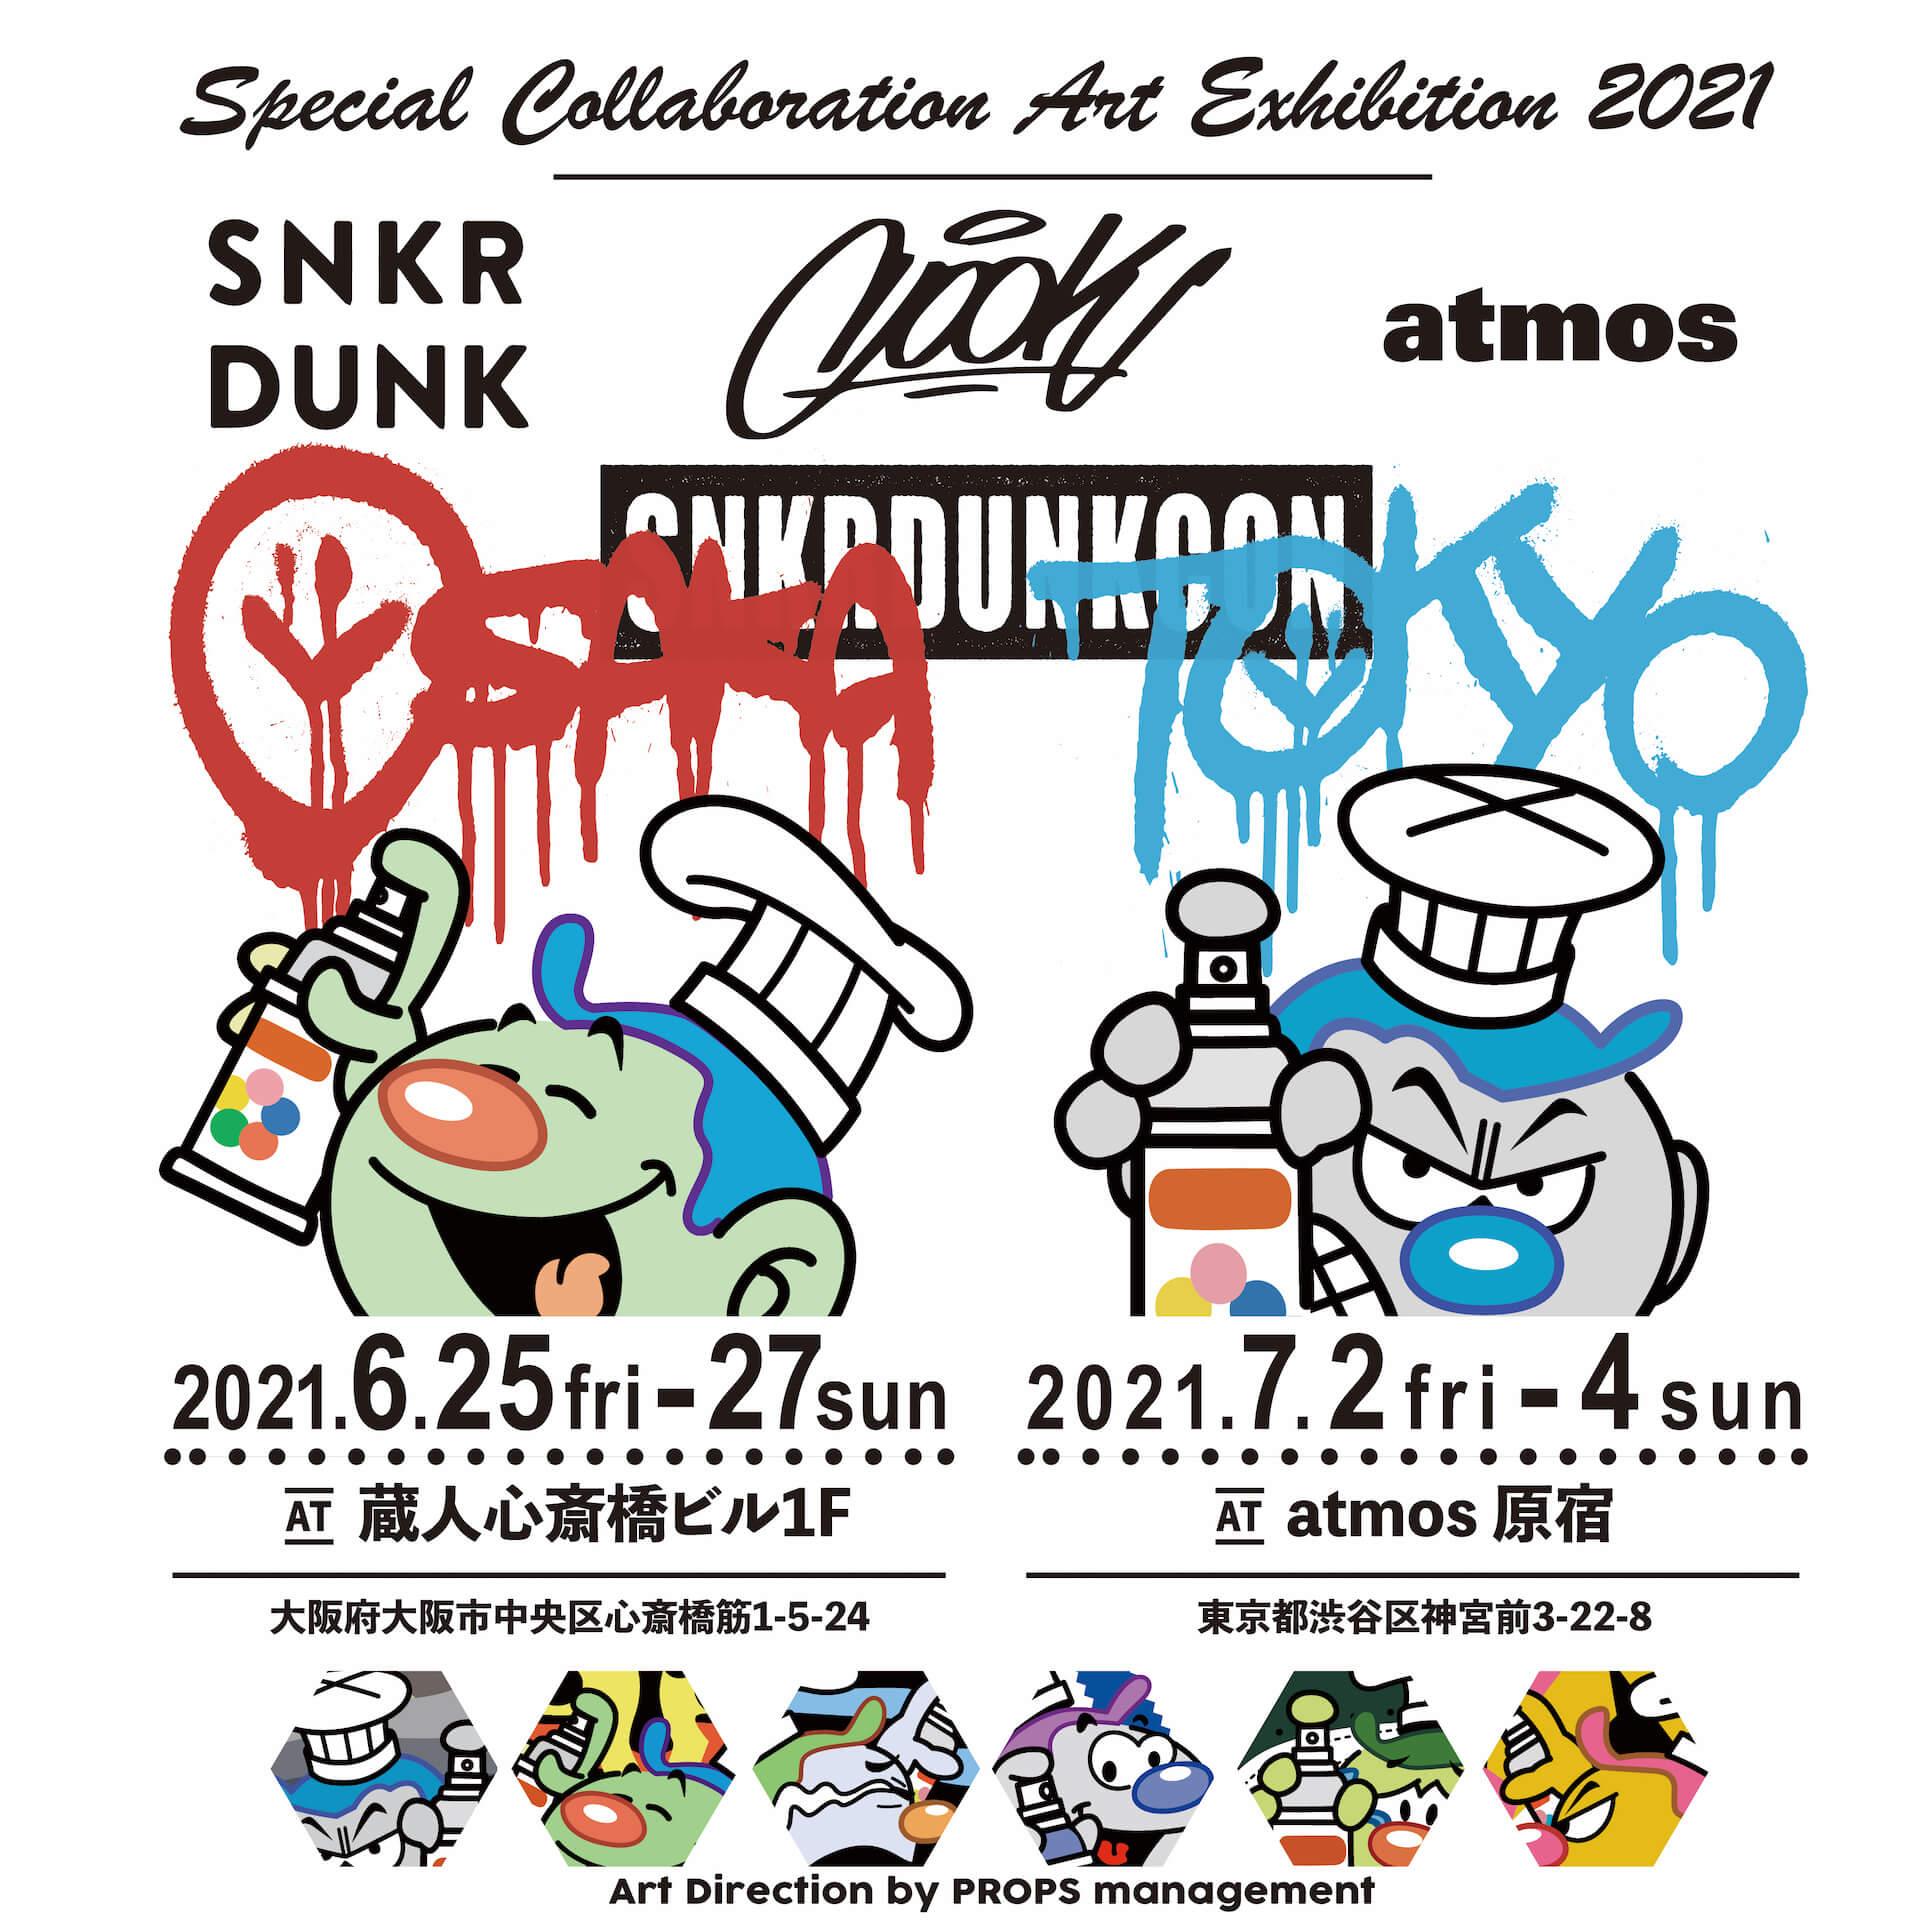 atmosがトリプルコラボレーション企画を実施!<COOK × SNKRDUNK × atmos Special Collaboration Art Exhibition 2021>が開催 Fashion210622_atomos-props1